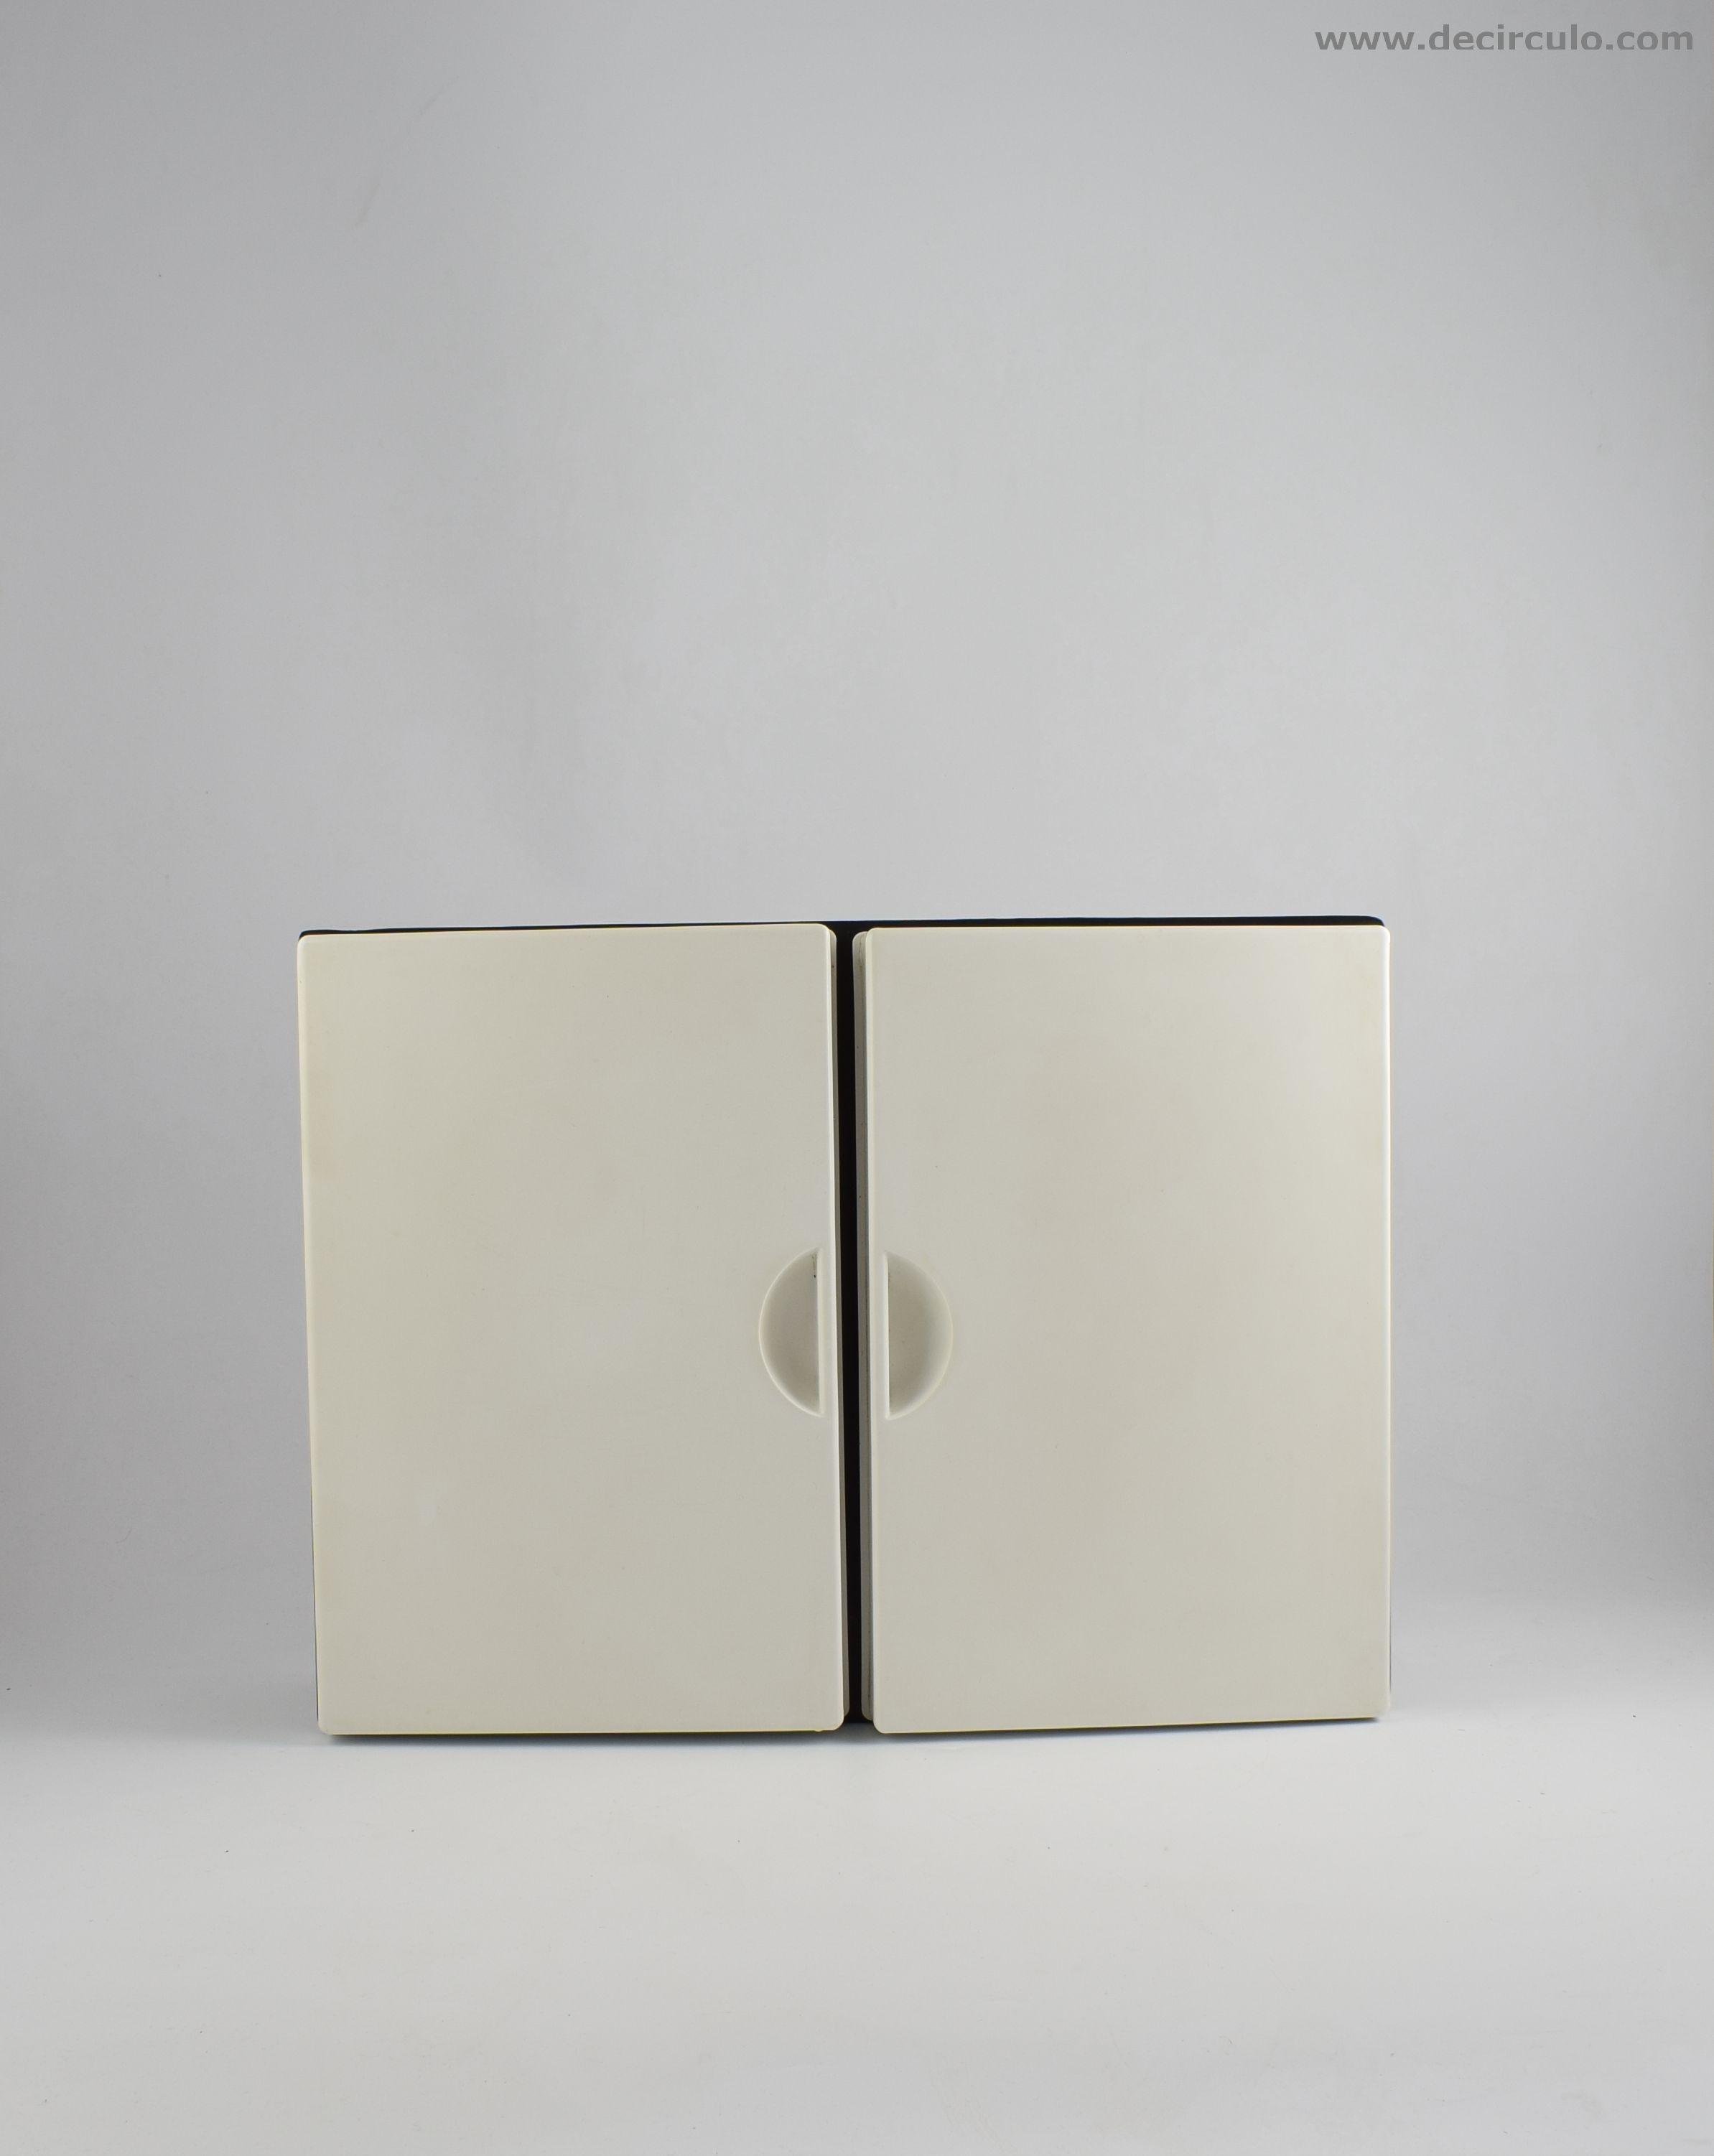 Bakelite Cabinet Plastic Press Milano